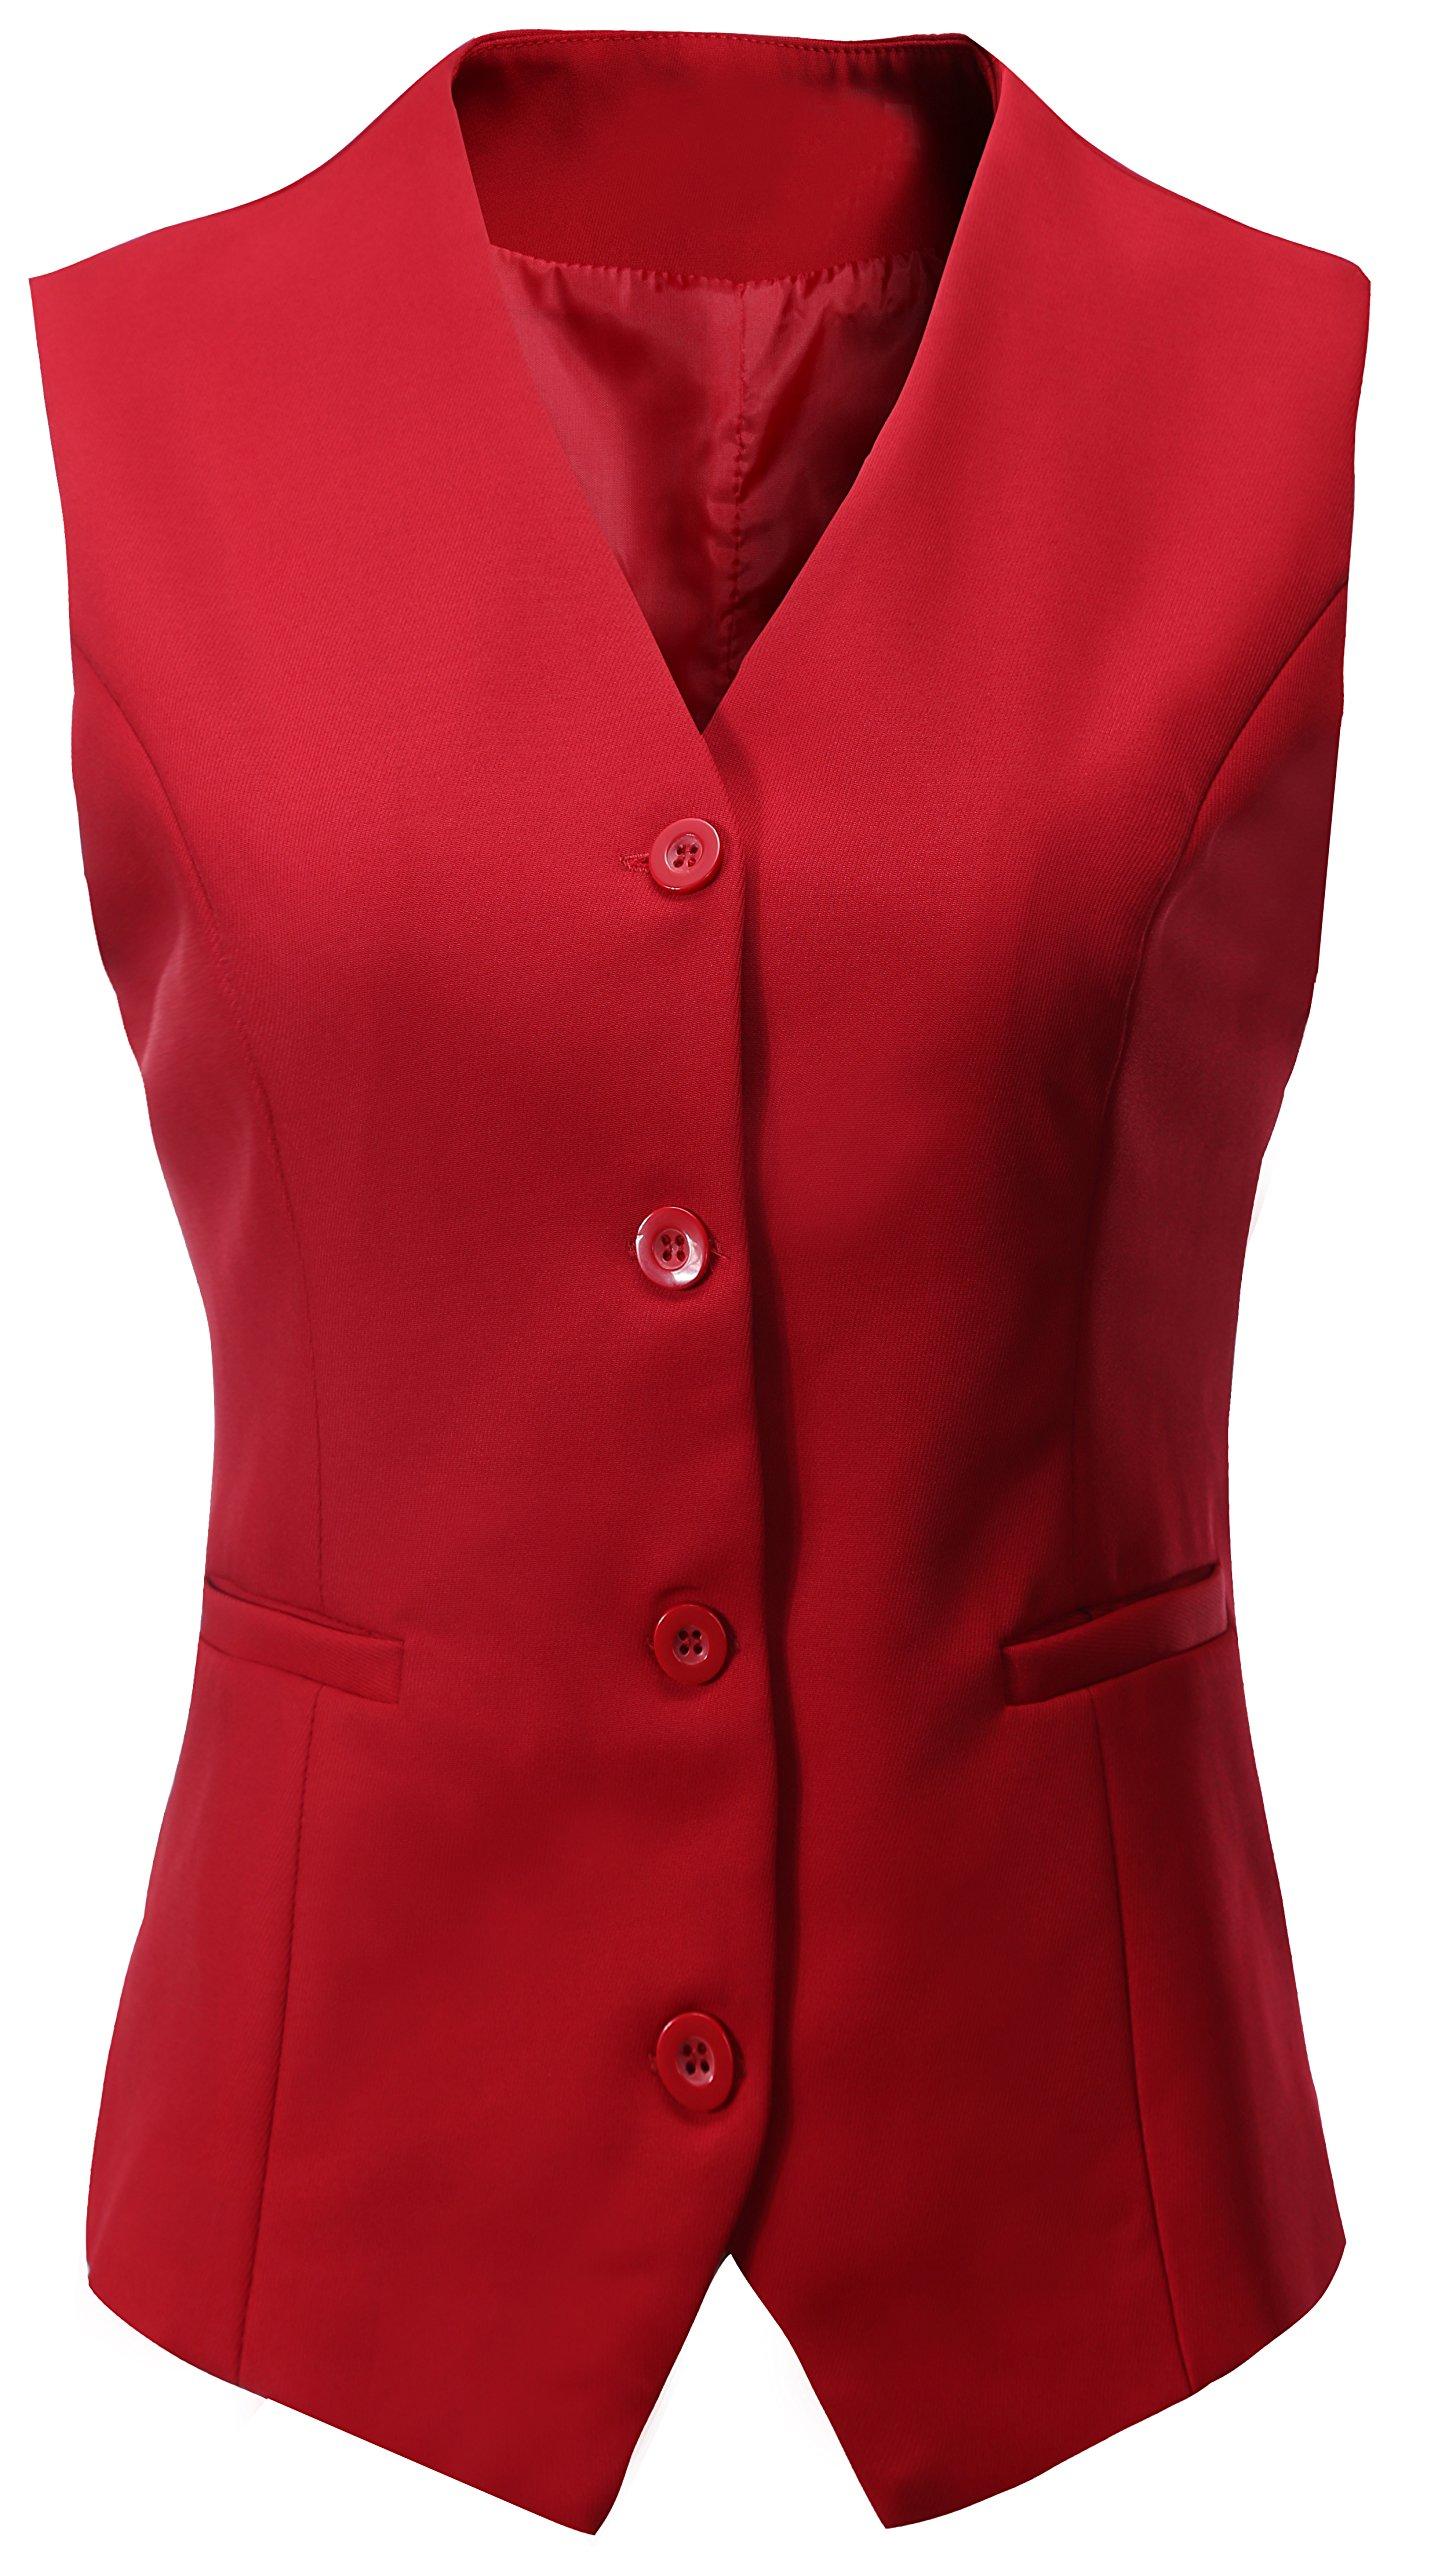 Vocni Women's Fully Lined 4 Button V-Neck Economy Dressy Suit Vest Waistcoat,Red,US S/Asia XL